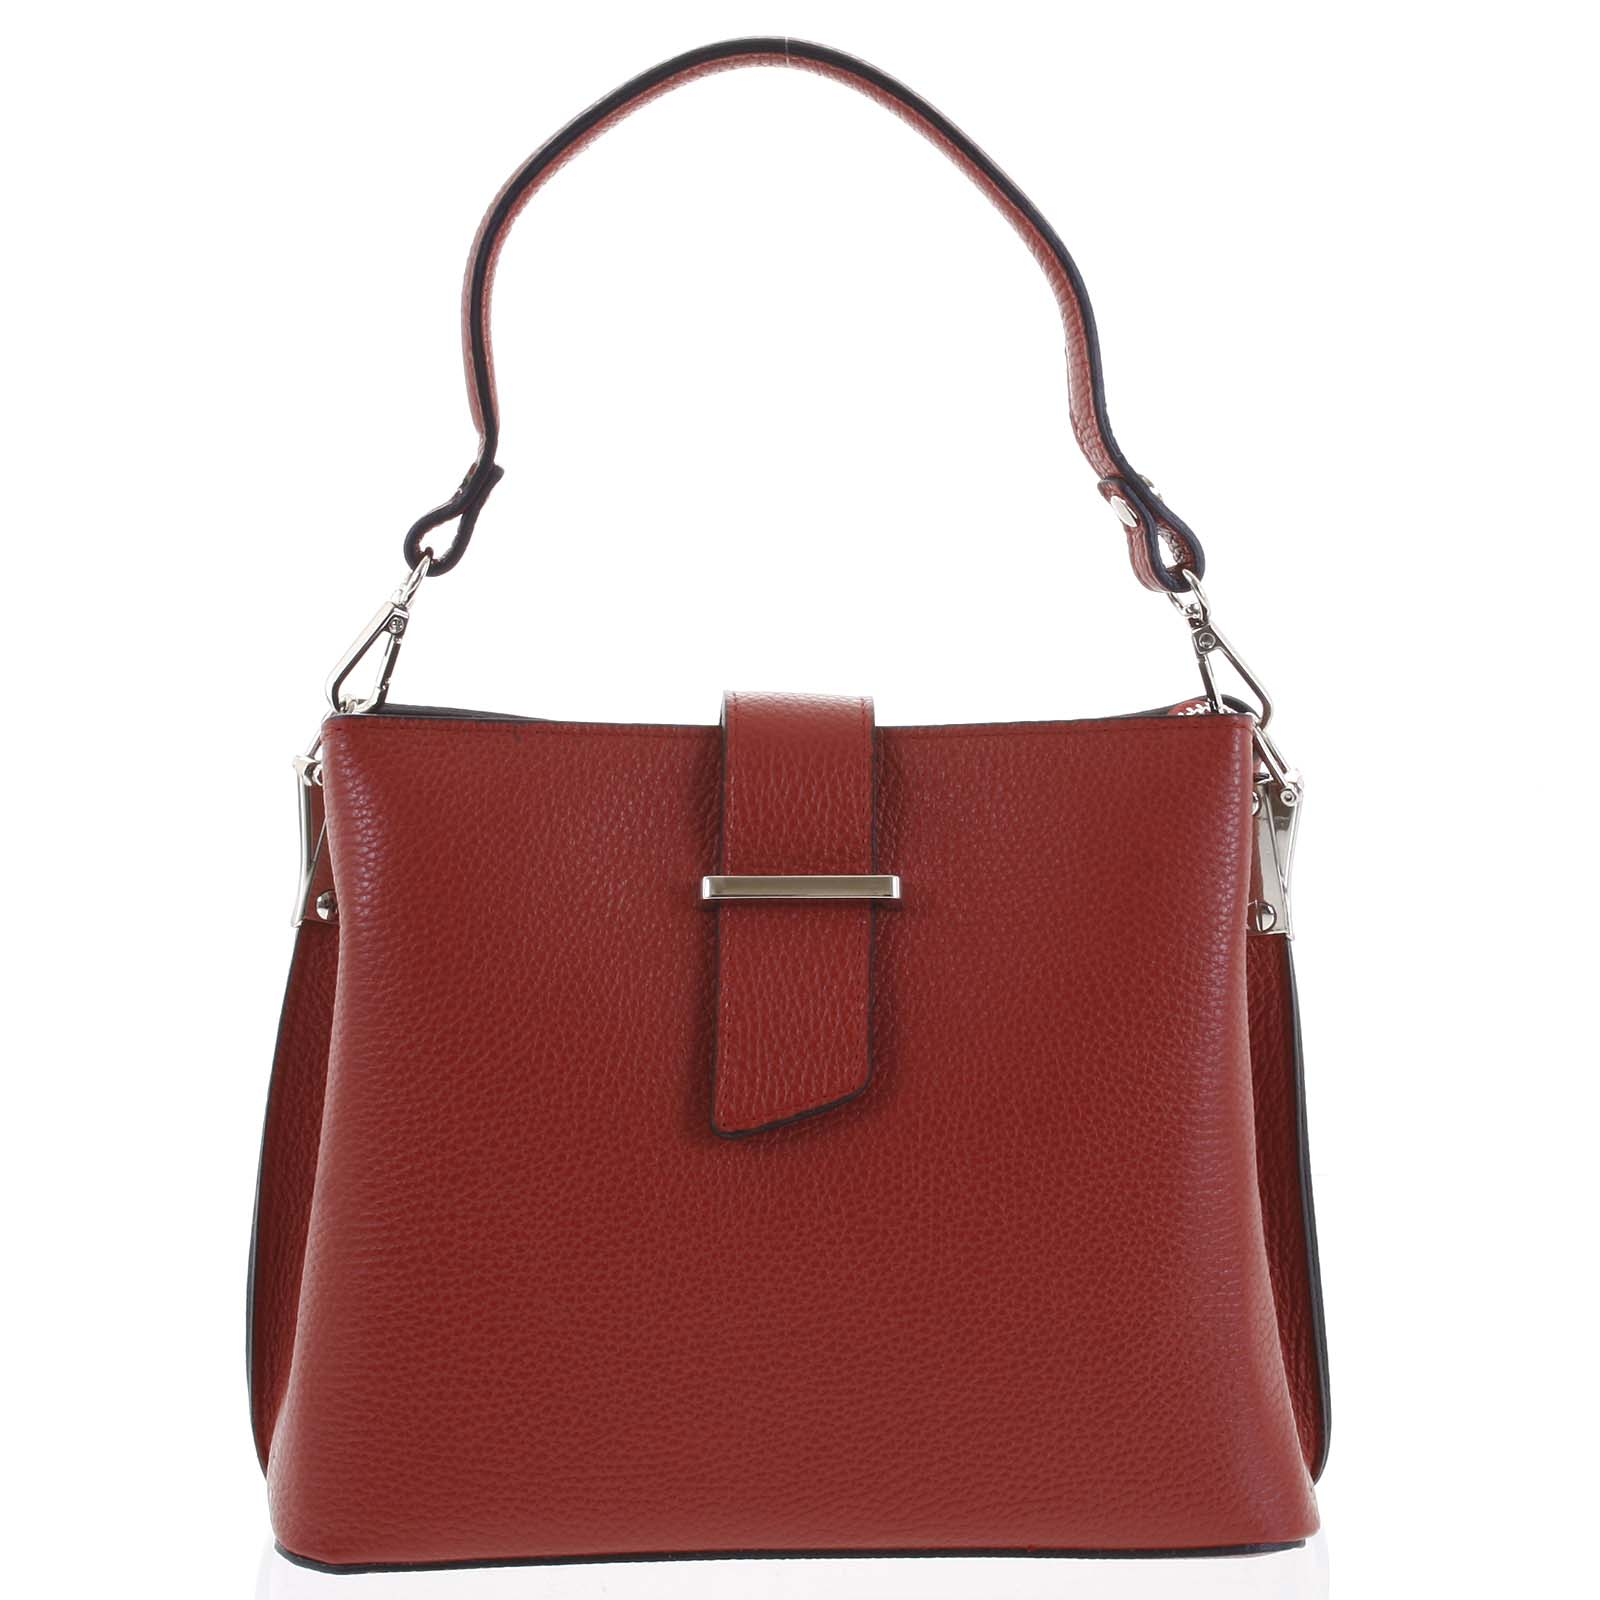 Dámska kožená kabelka do ruky tmavo červená - ItalY Auren červená